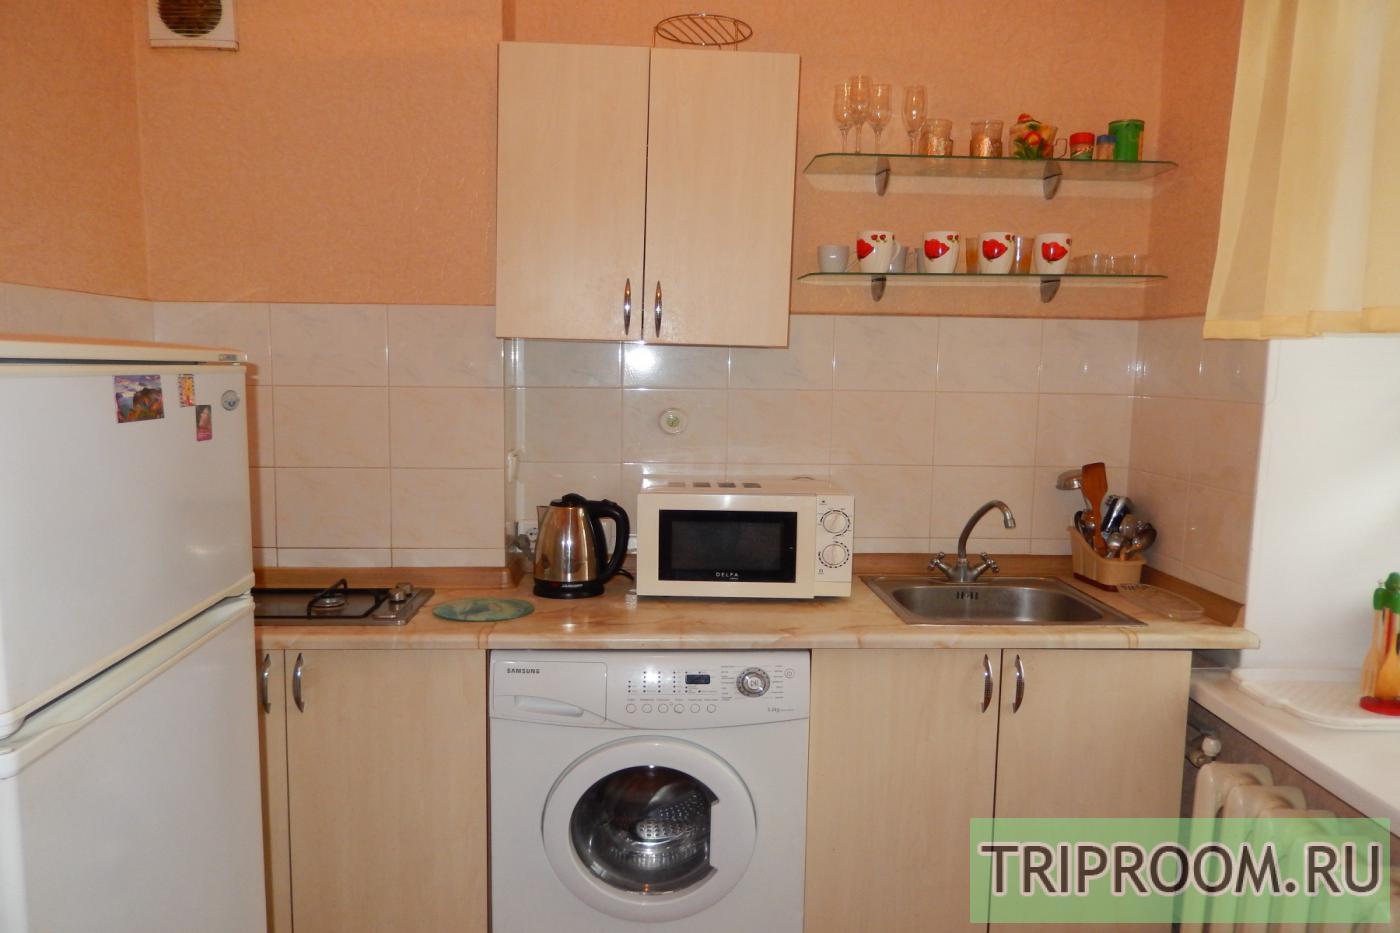 2-комнатная квартира посуточно (вариант № 21949), ул. Очаковцев улица, фото № 7